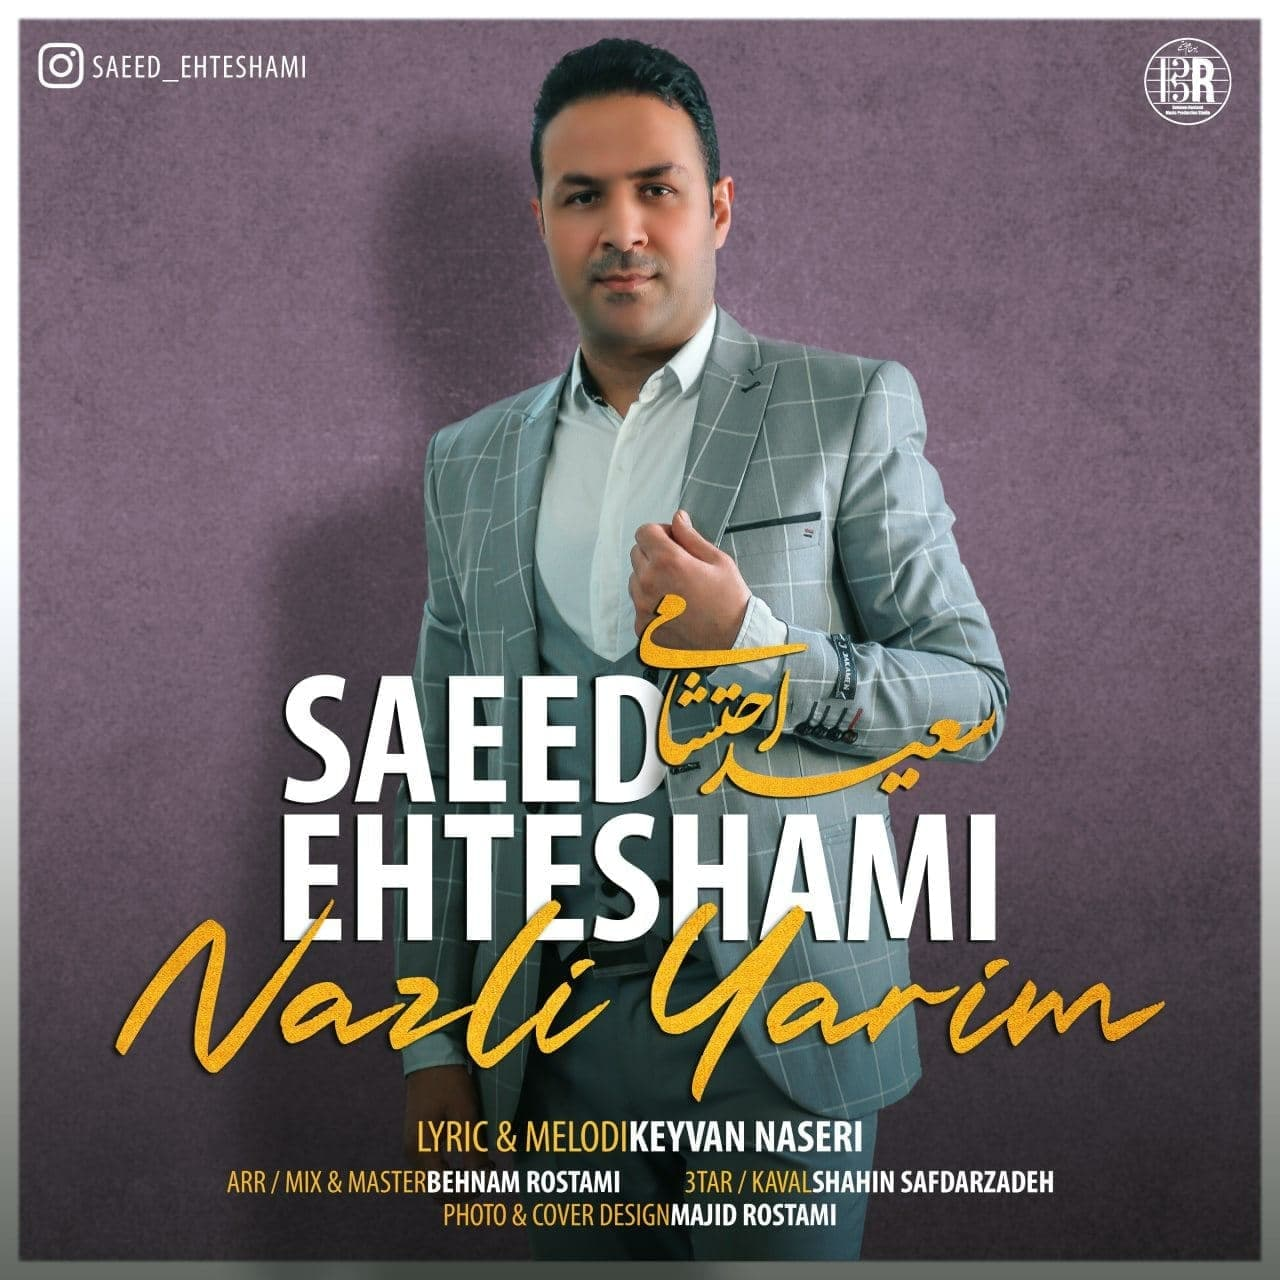 https://s18.picofile.com/file/8433610000/11Saeed_Ehteshami_Nazli_Yarim.jpg